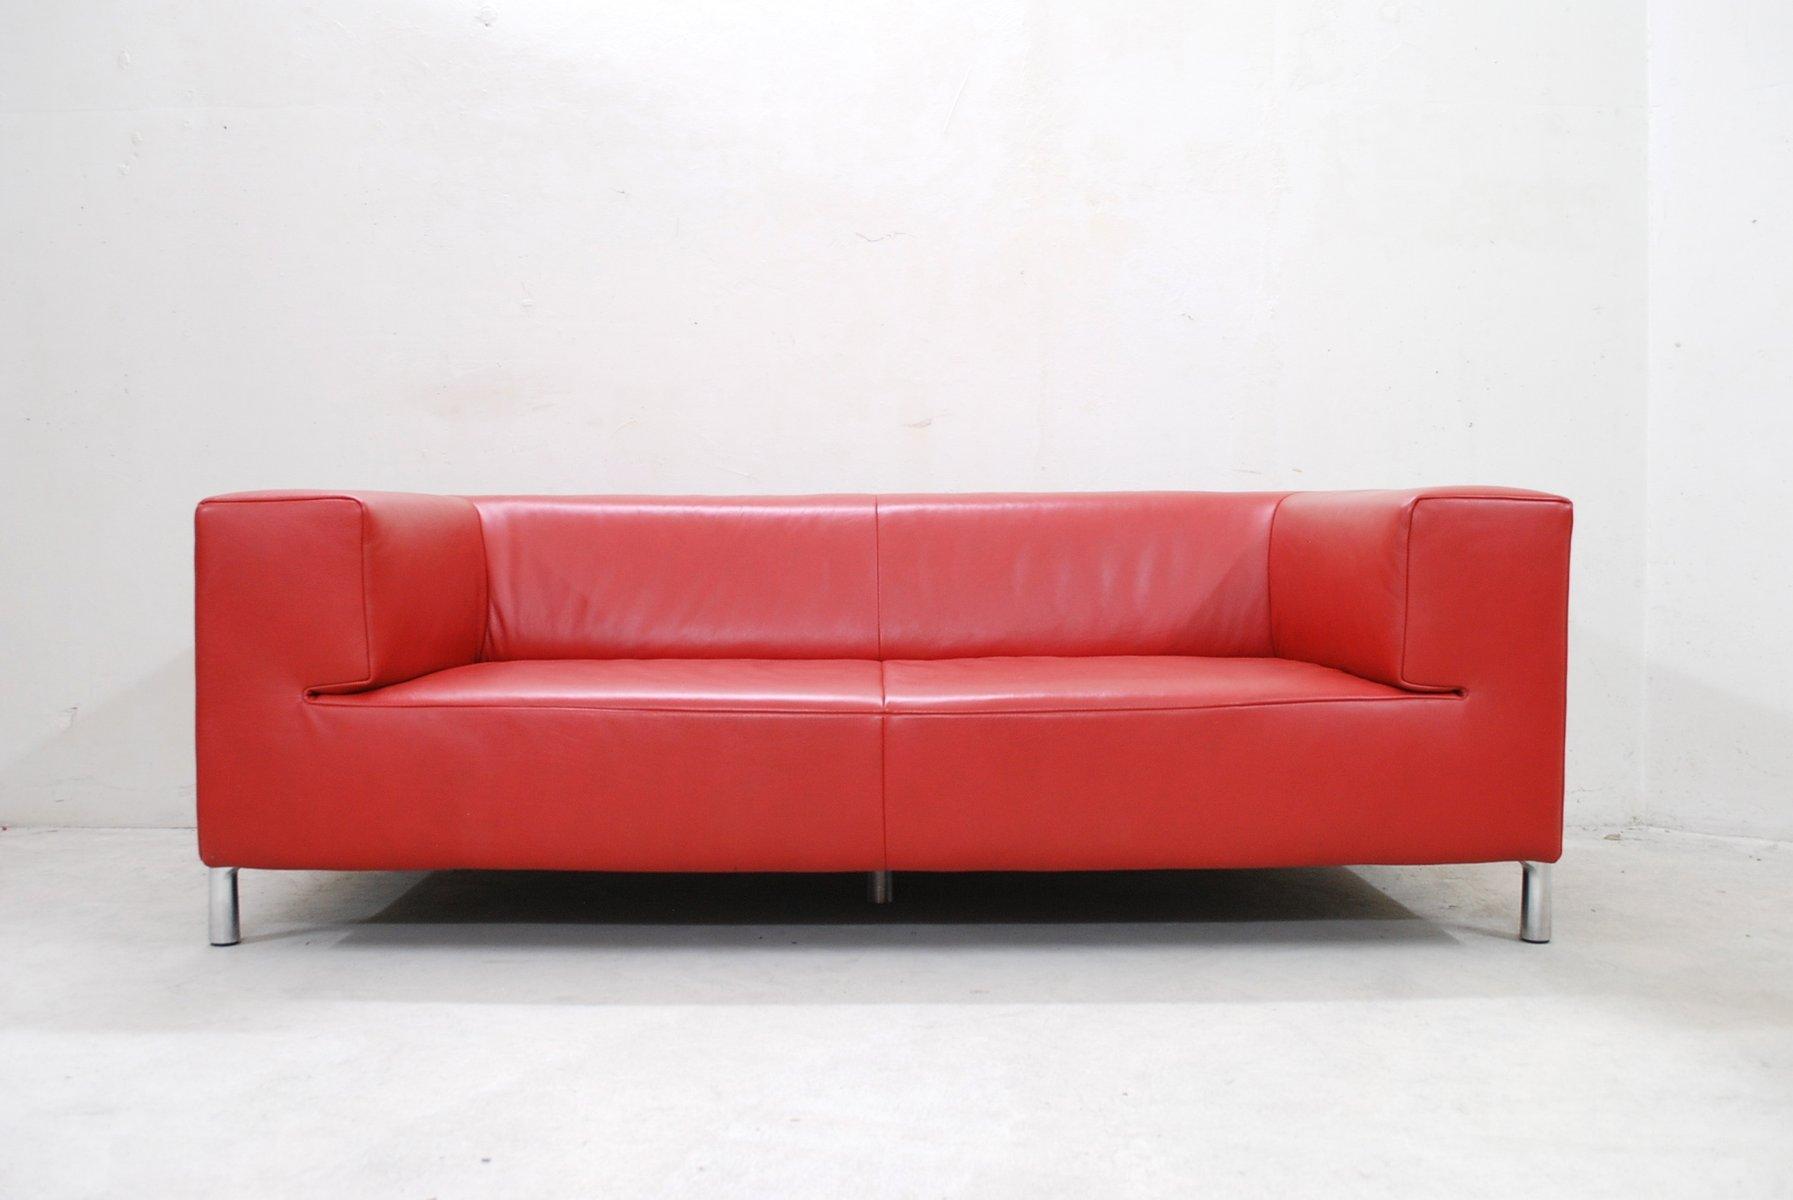 Divano genesis vintage in pelle rossa di koinor in vendita - Divano vintage pelle ...